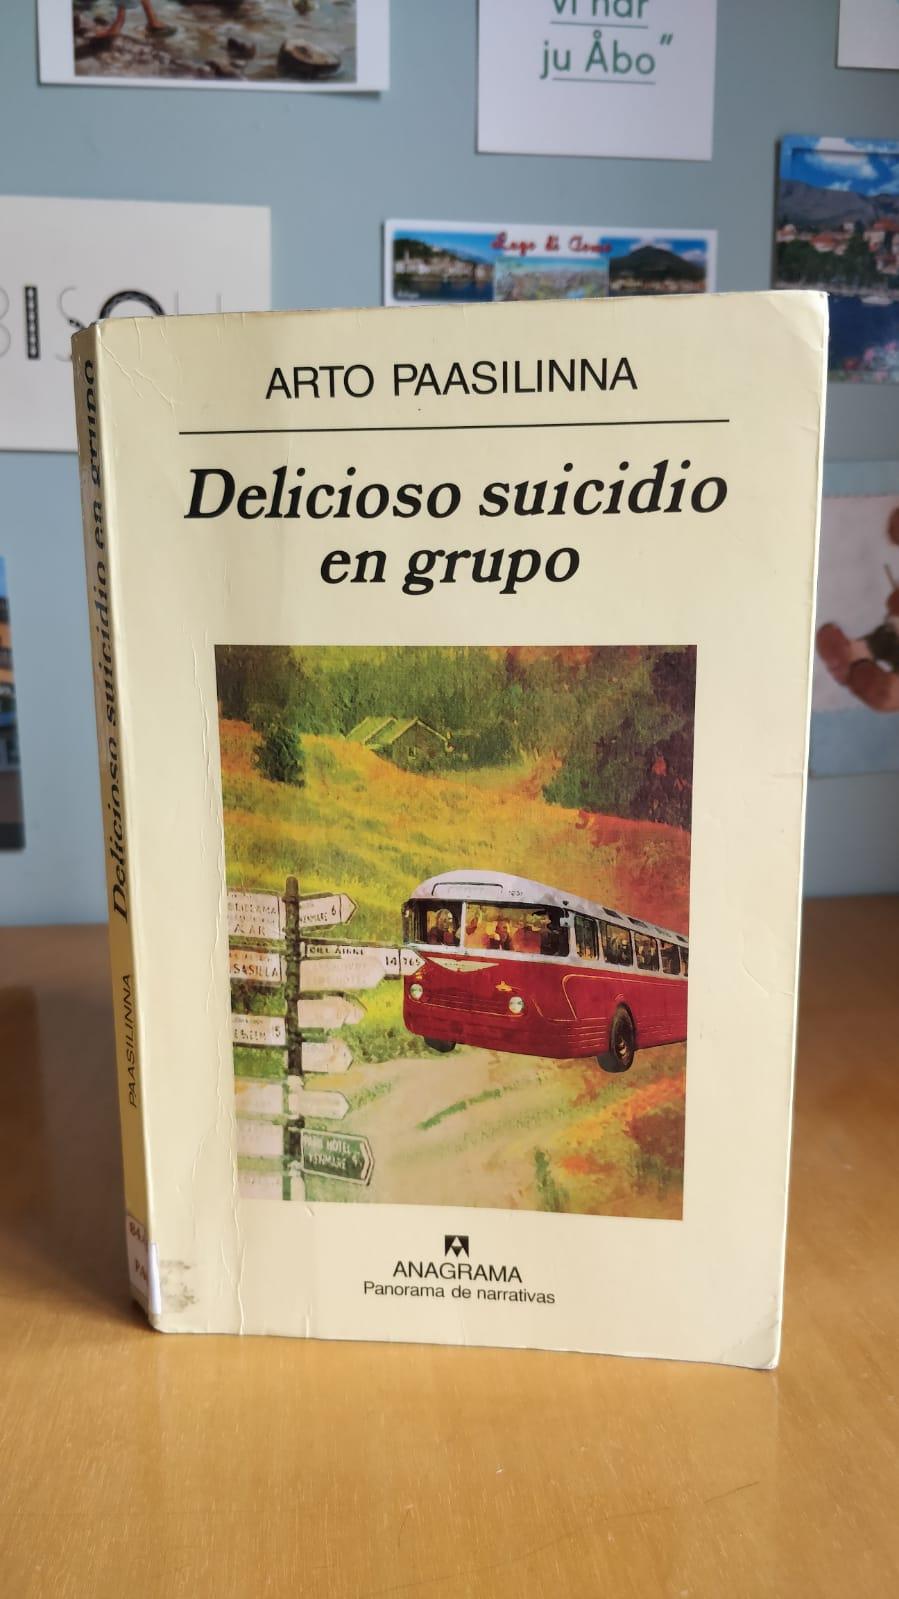 Portada libro de Arto Paasilinna